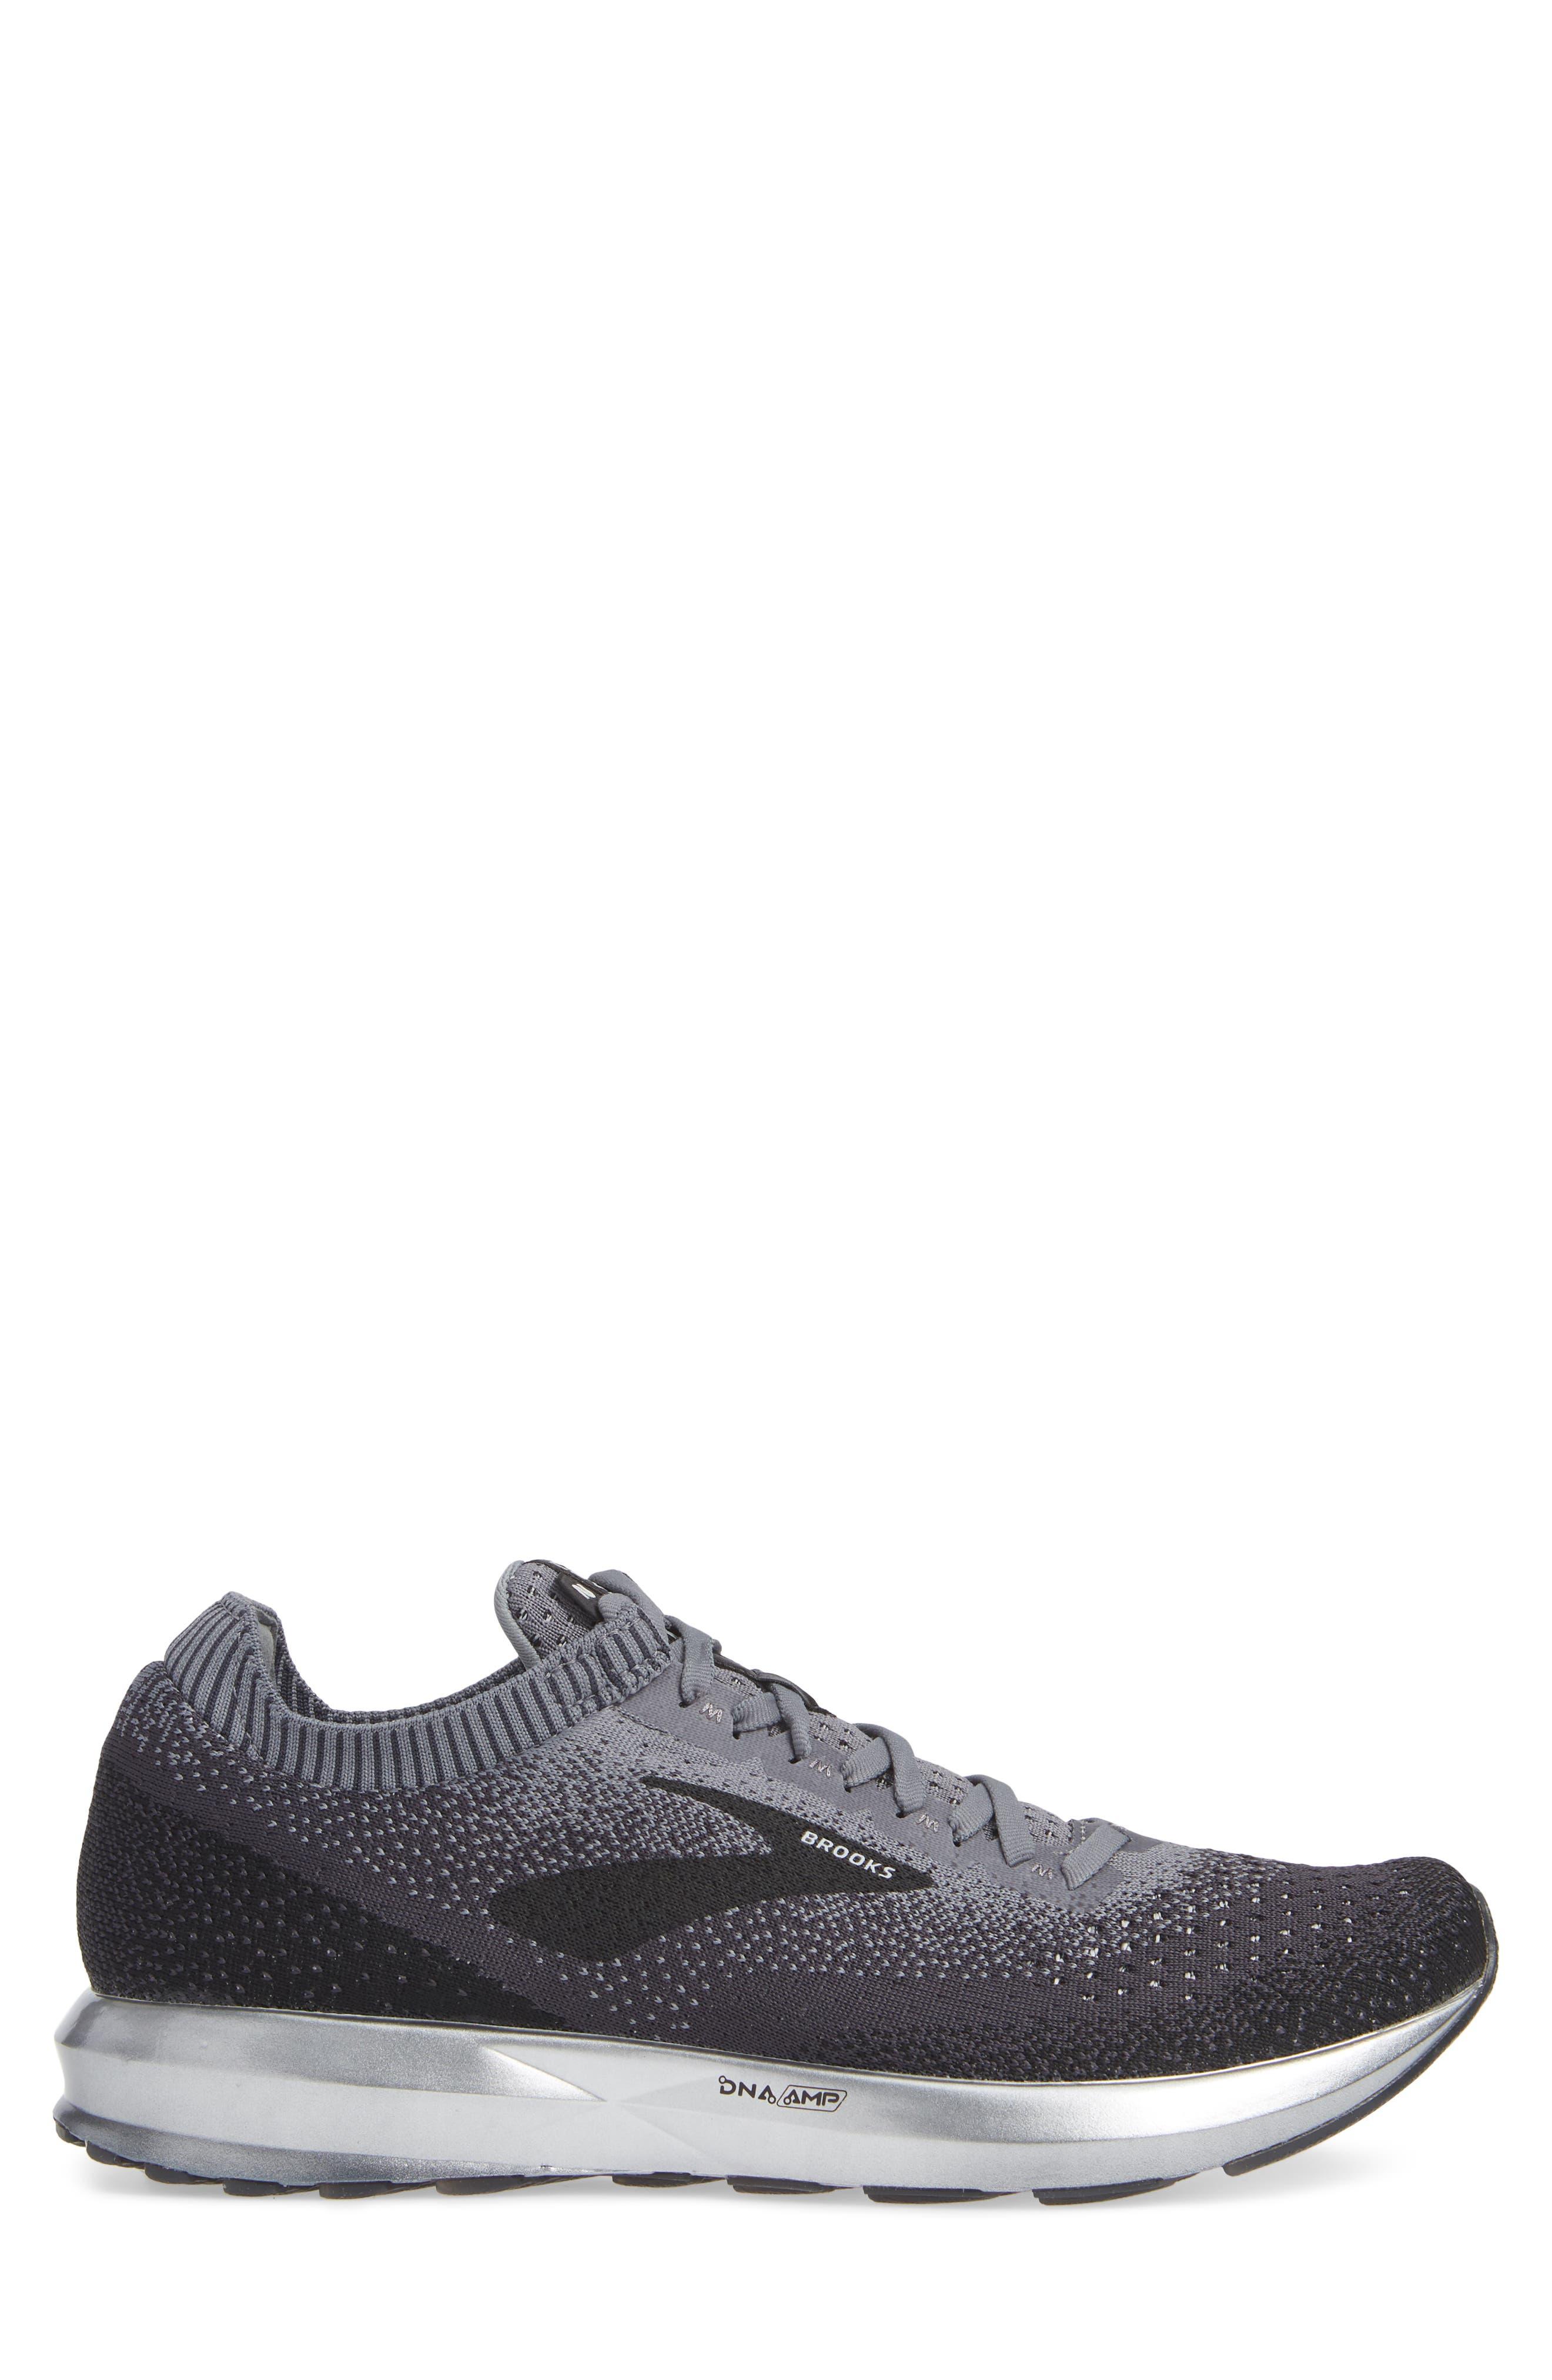 Levitate 2 Running Shoe,                             Alternate thumbnail 3, color,                             BLACK/ GREY/ EBONY